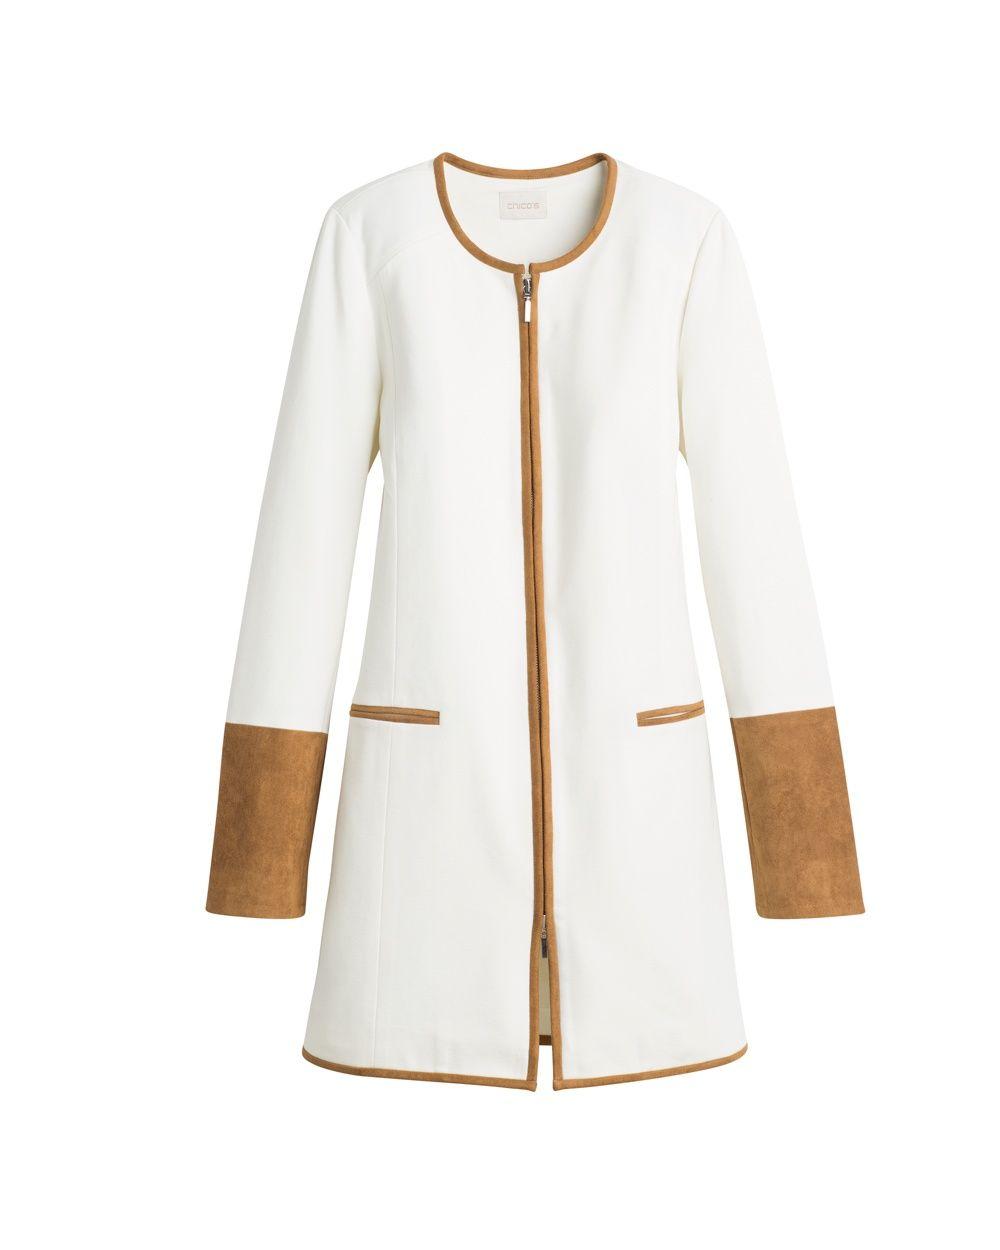 Shop Women's Jackets, Vests & Blazers - Chico's